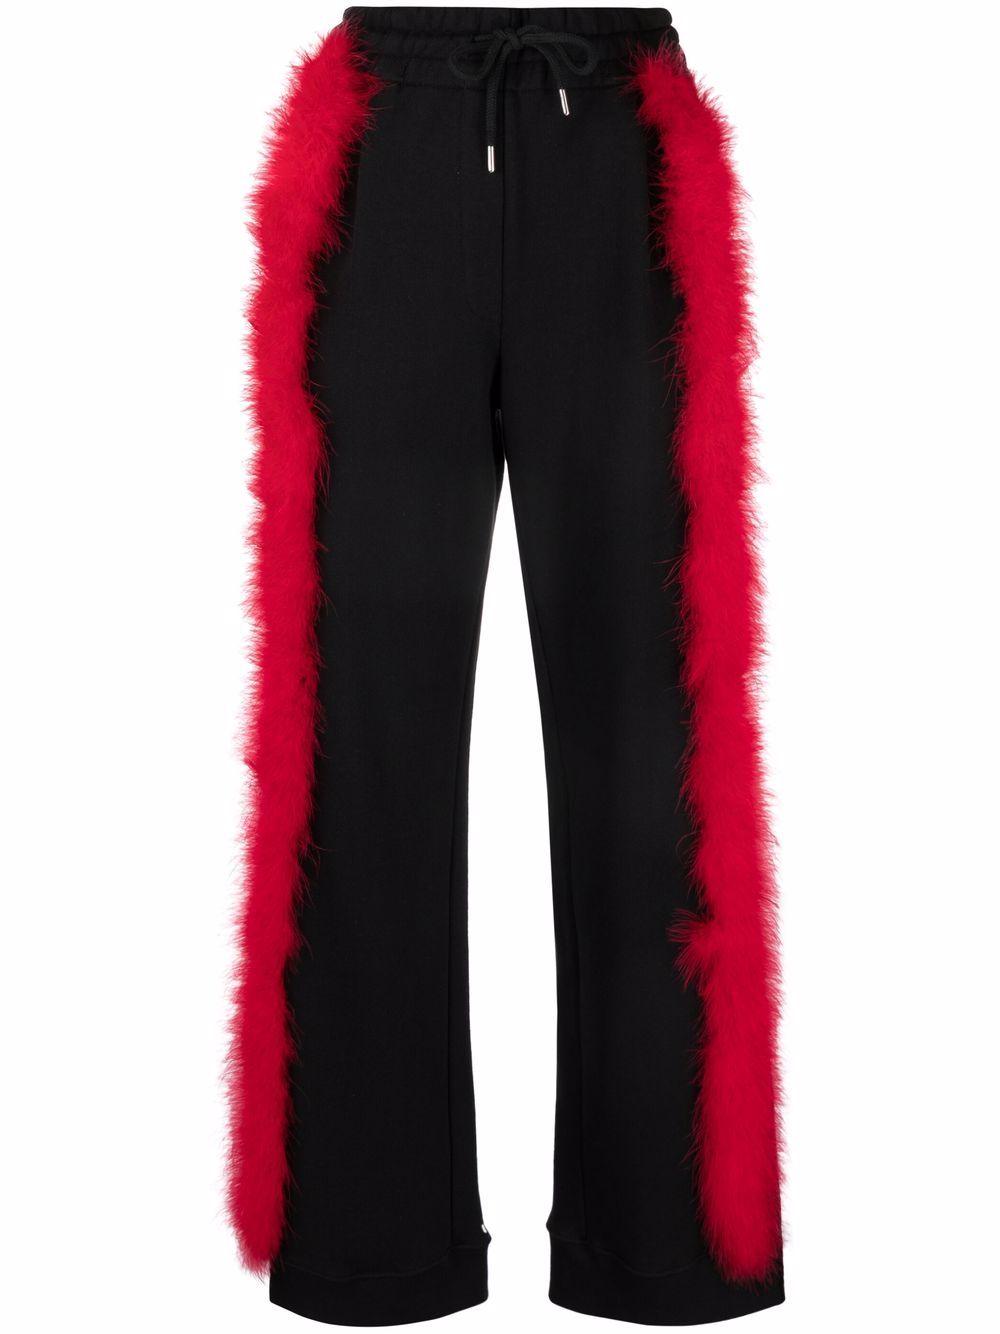 DRIES VAN NOTEN- Hansens Cotton Trousers- Woman- M - Black